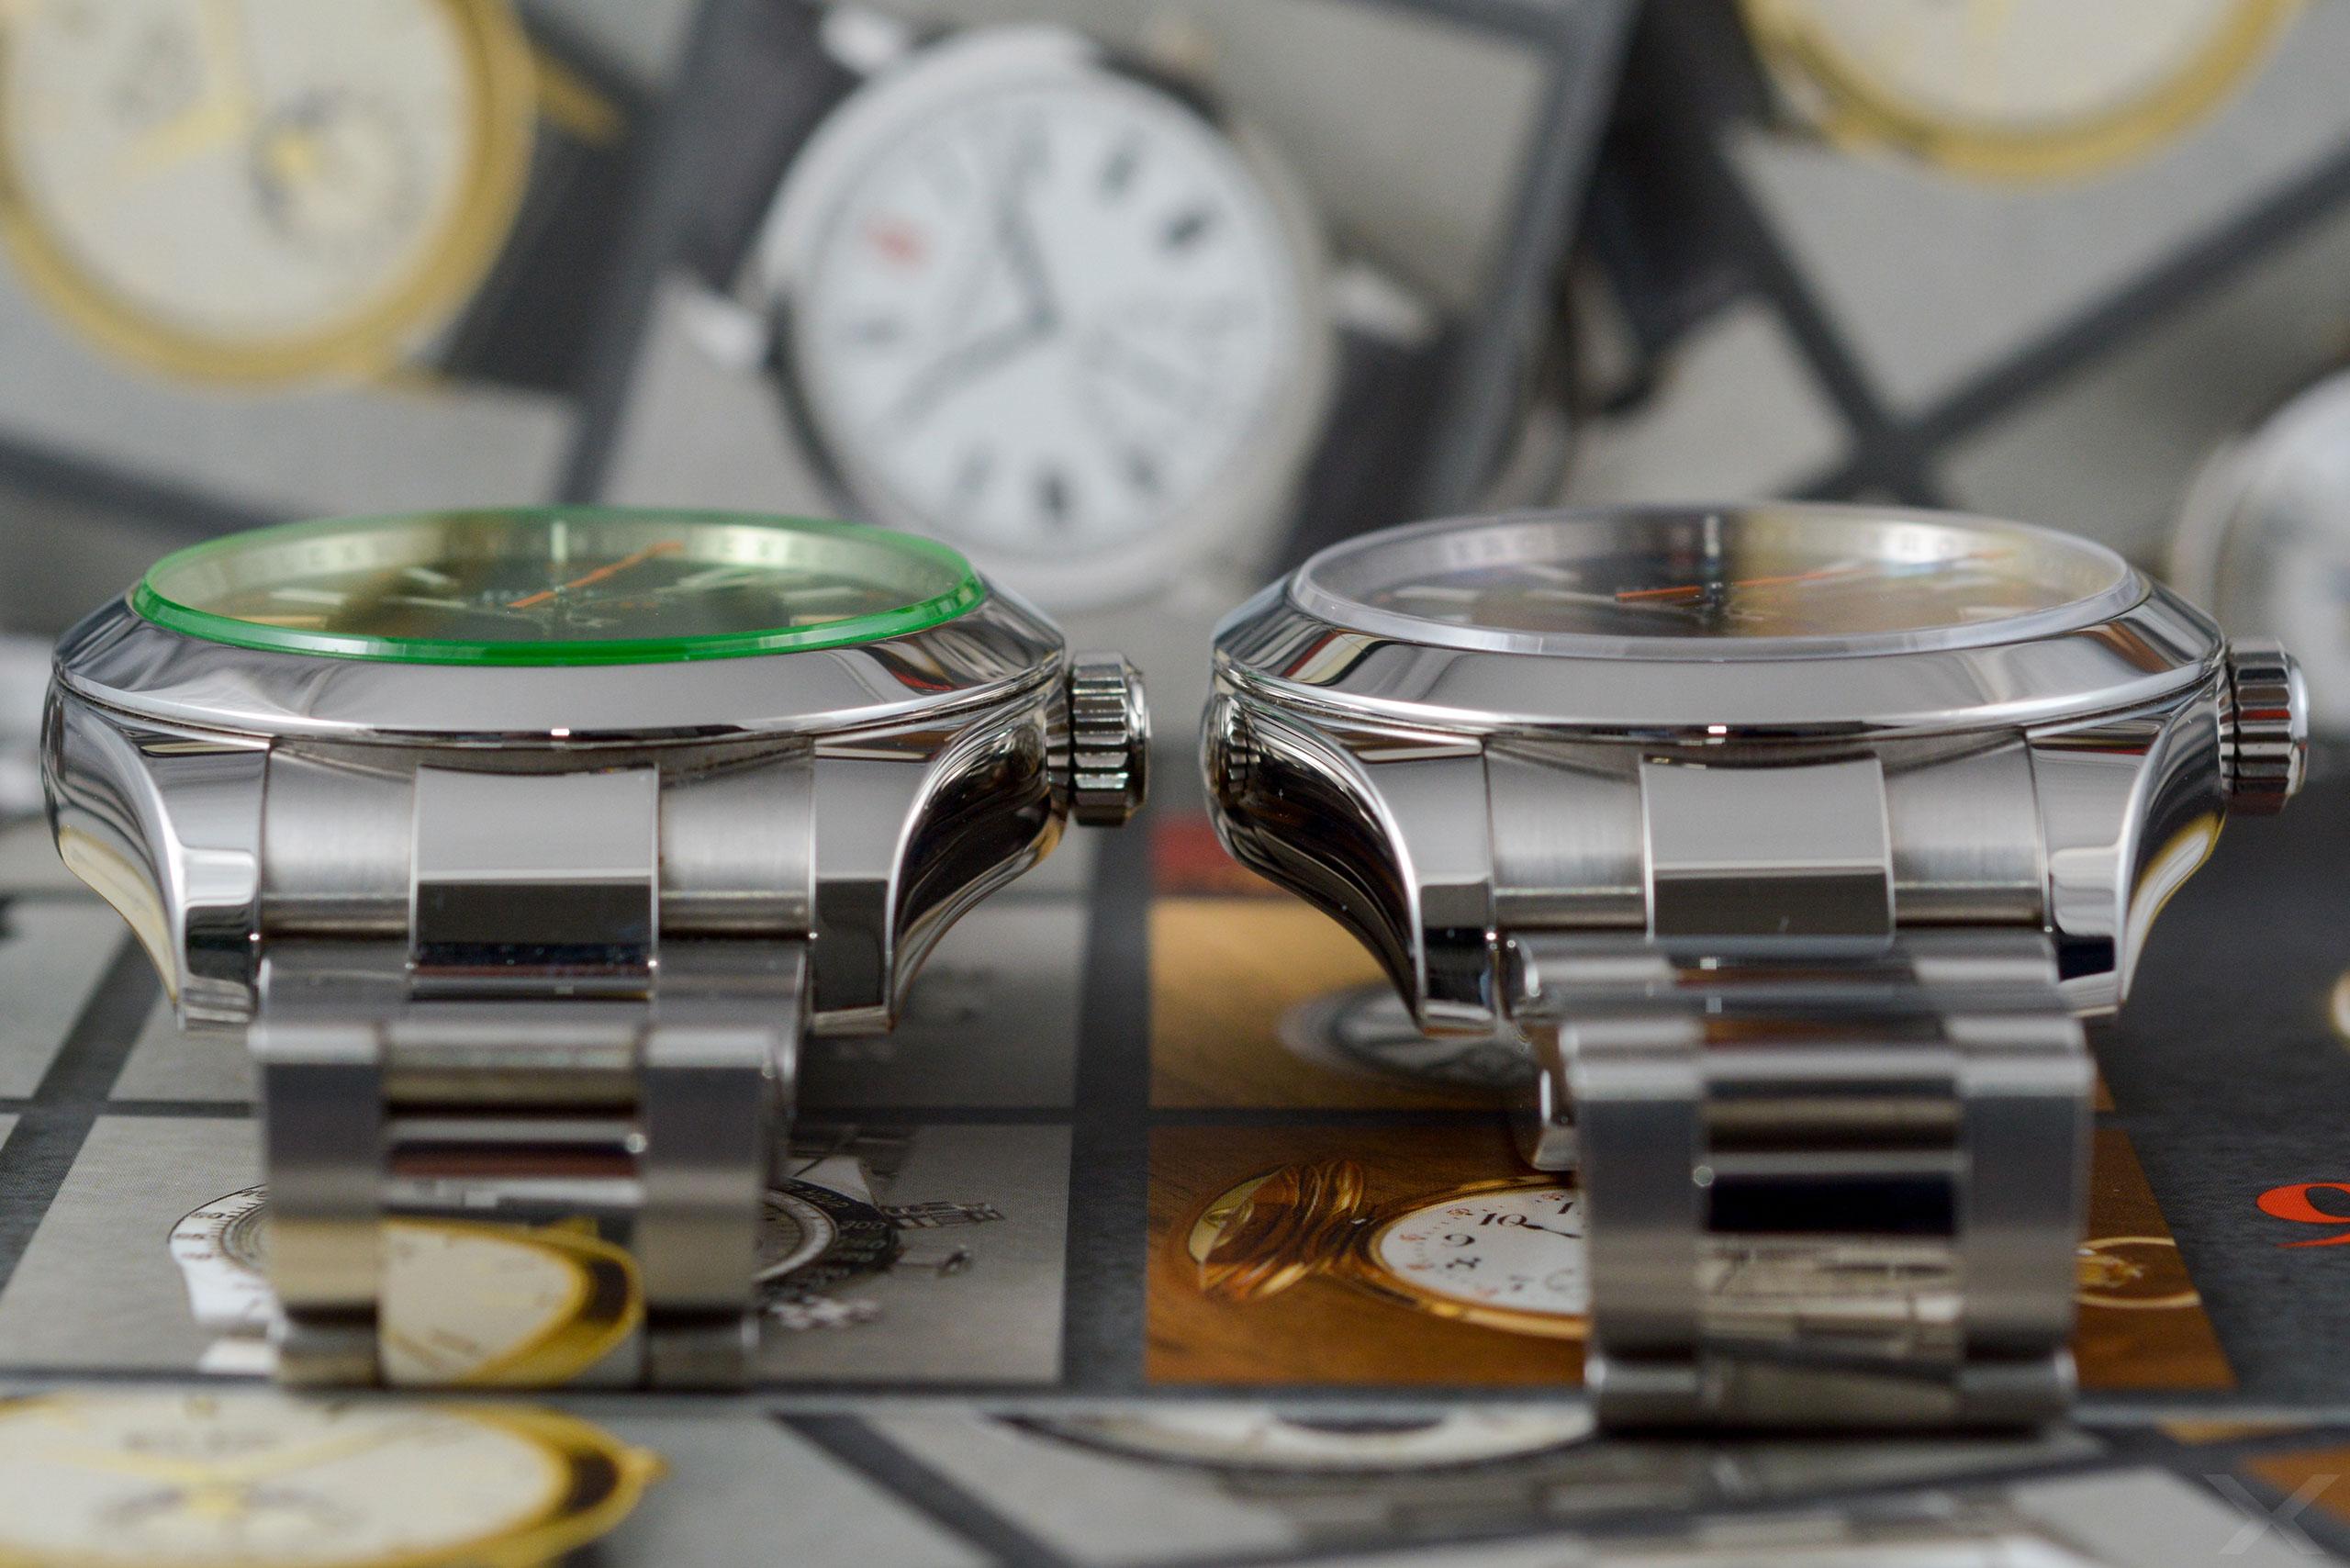 Rolex Milgauss 116400 Dr Crott Luxify